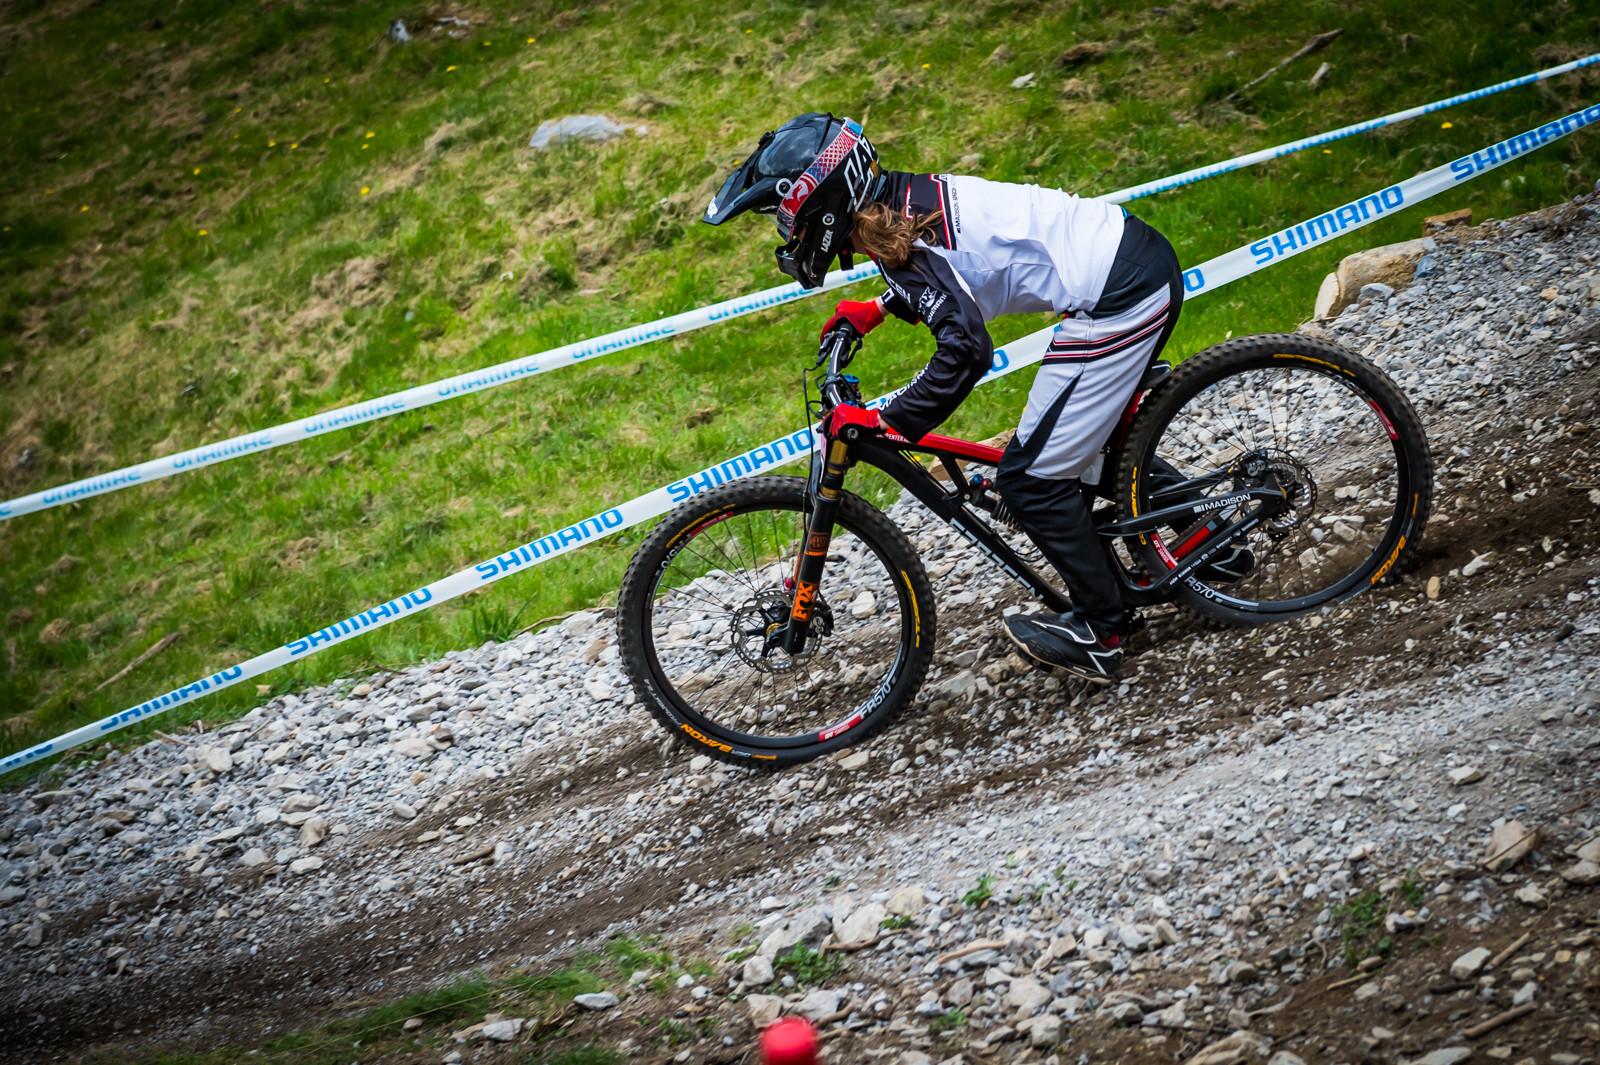 Manon Carpenter G-Out Project - Lourdes World Cup - G-Out Project - Lourdes World Cup - Mountain Biking Pictures - Vital MTB